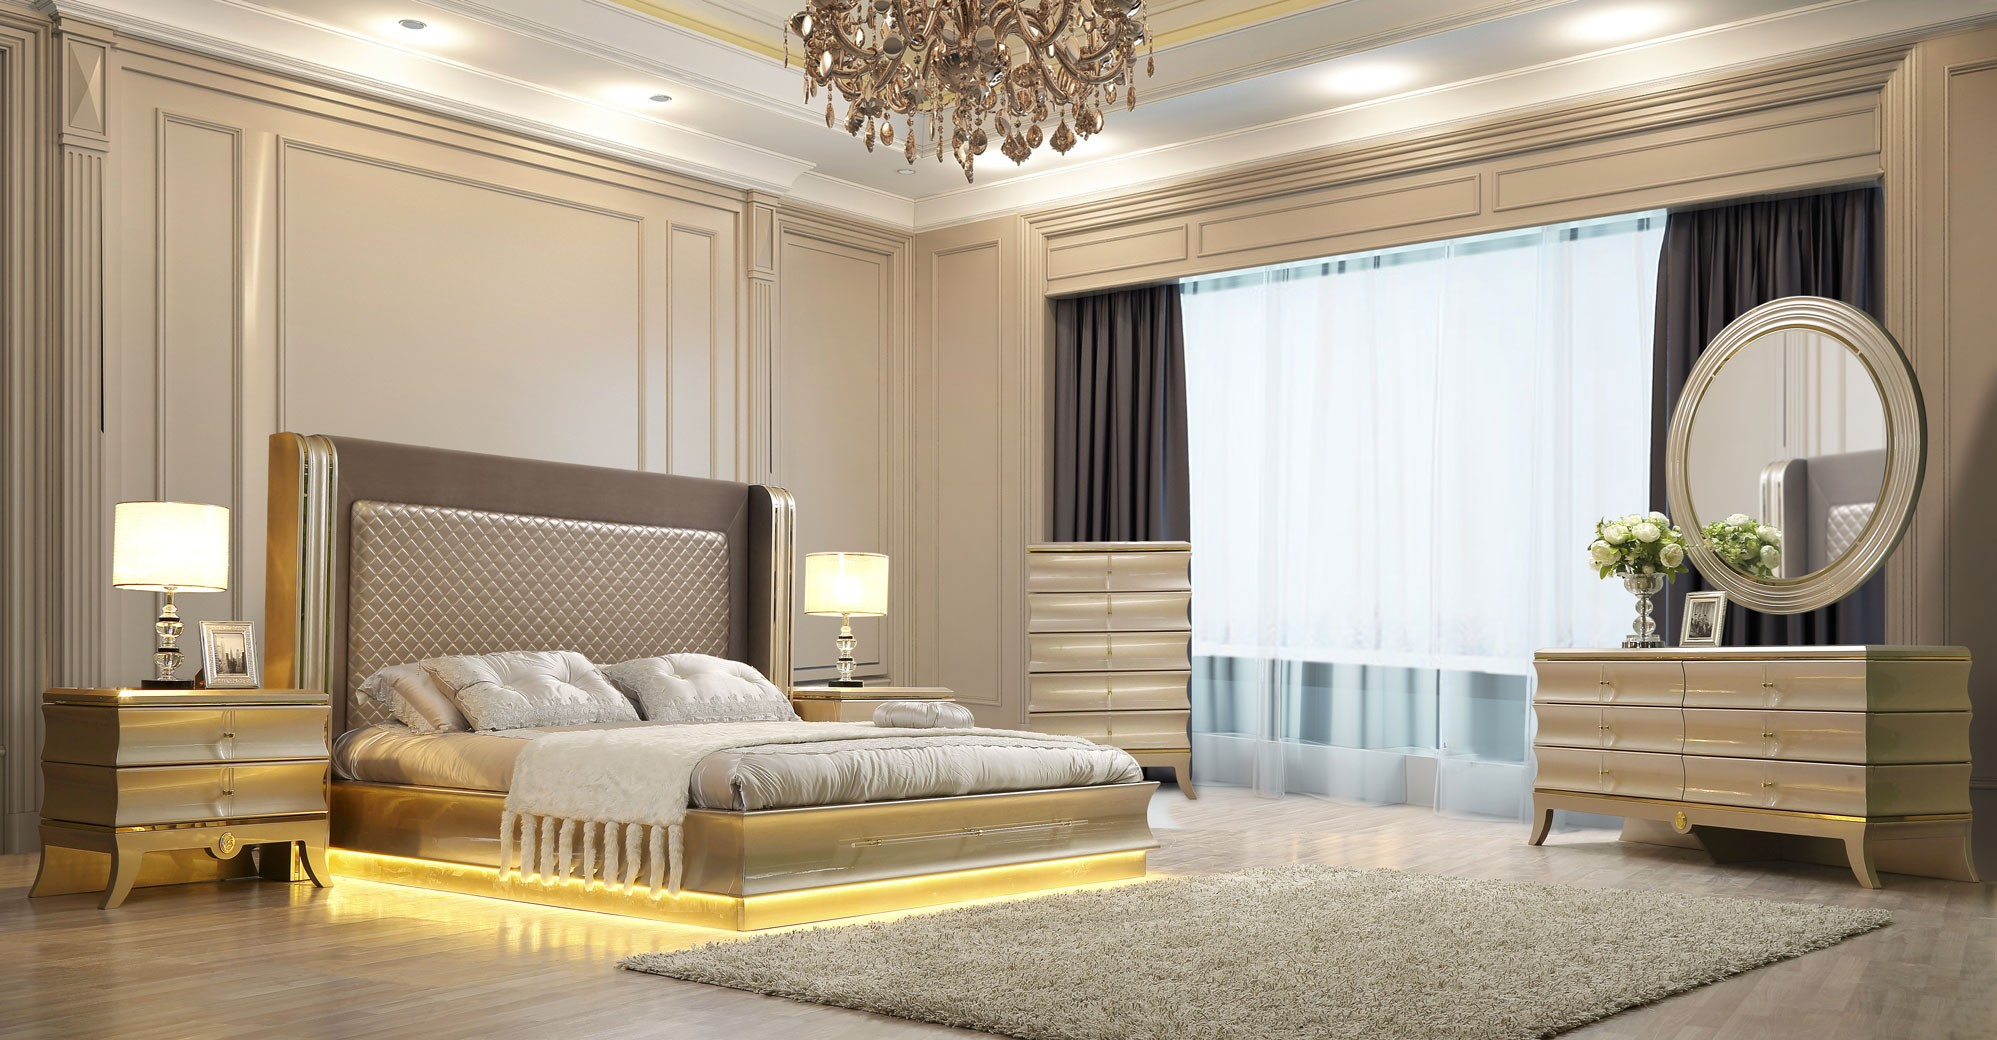 HD 925 Homey Design Bedroom Set Victorian, European U0026 Classic